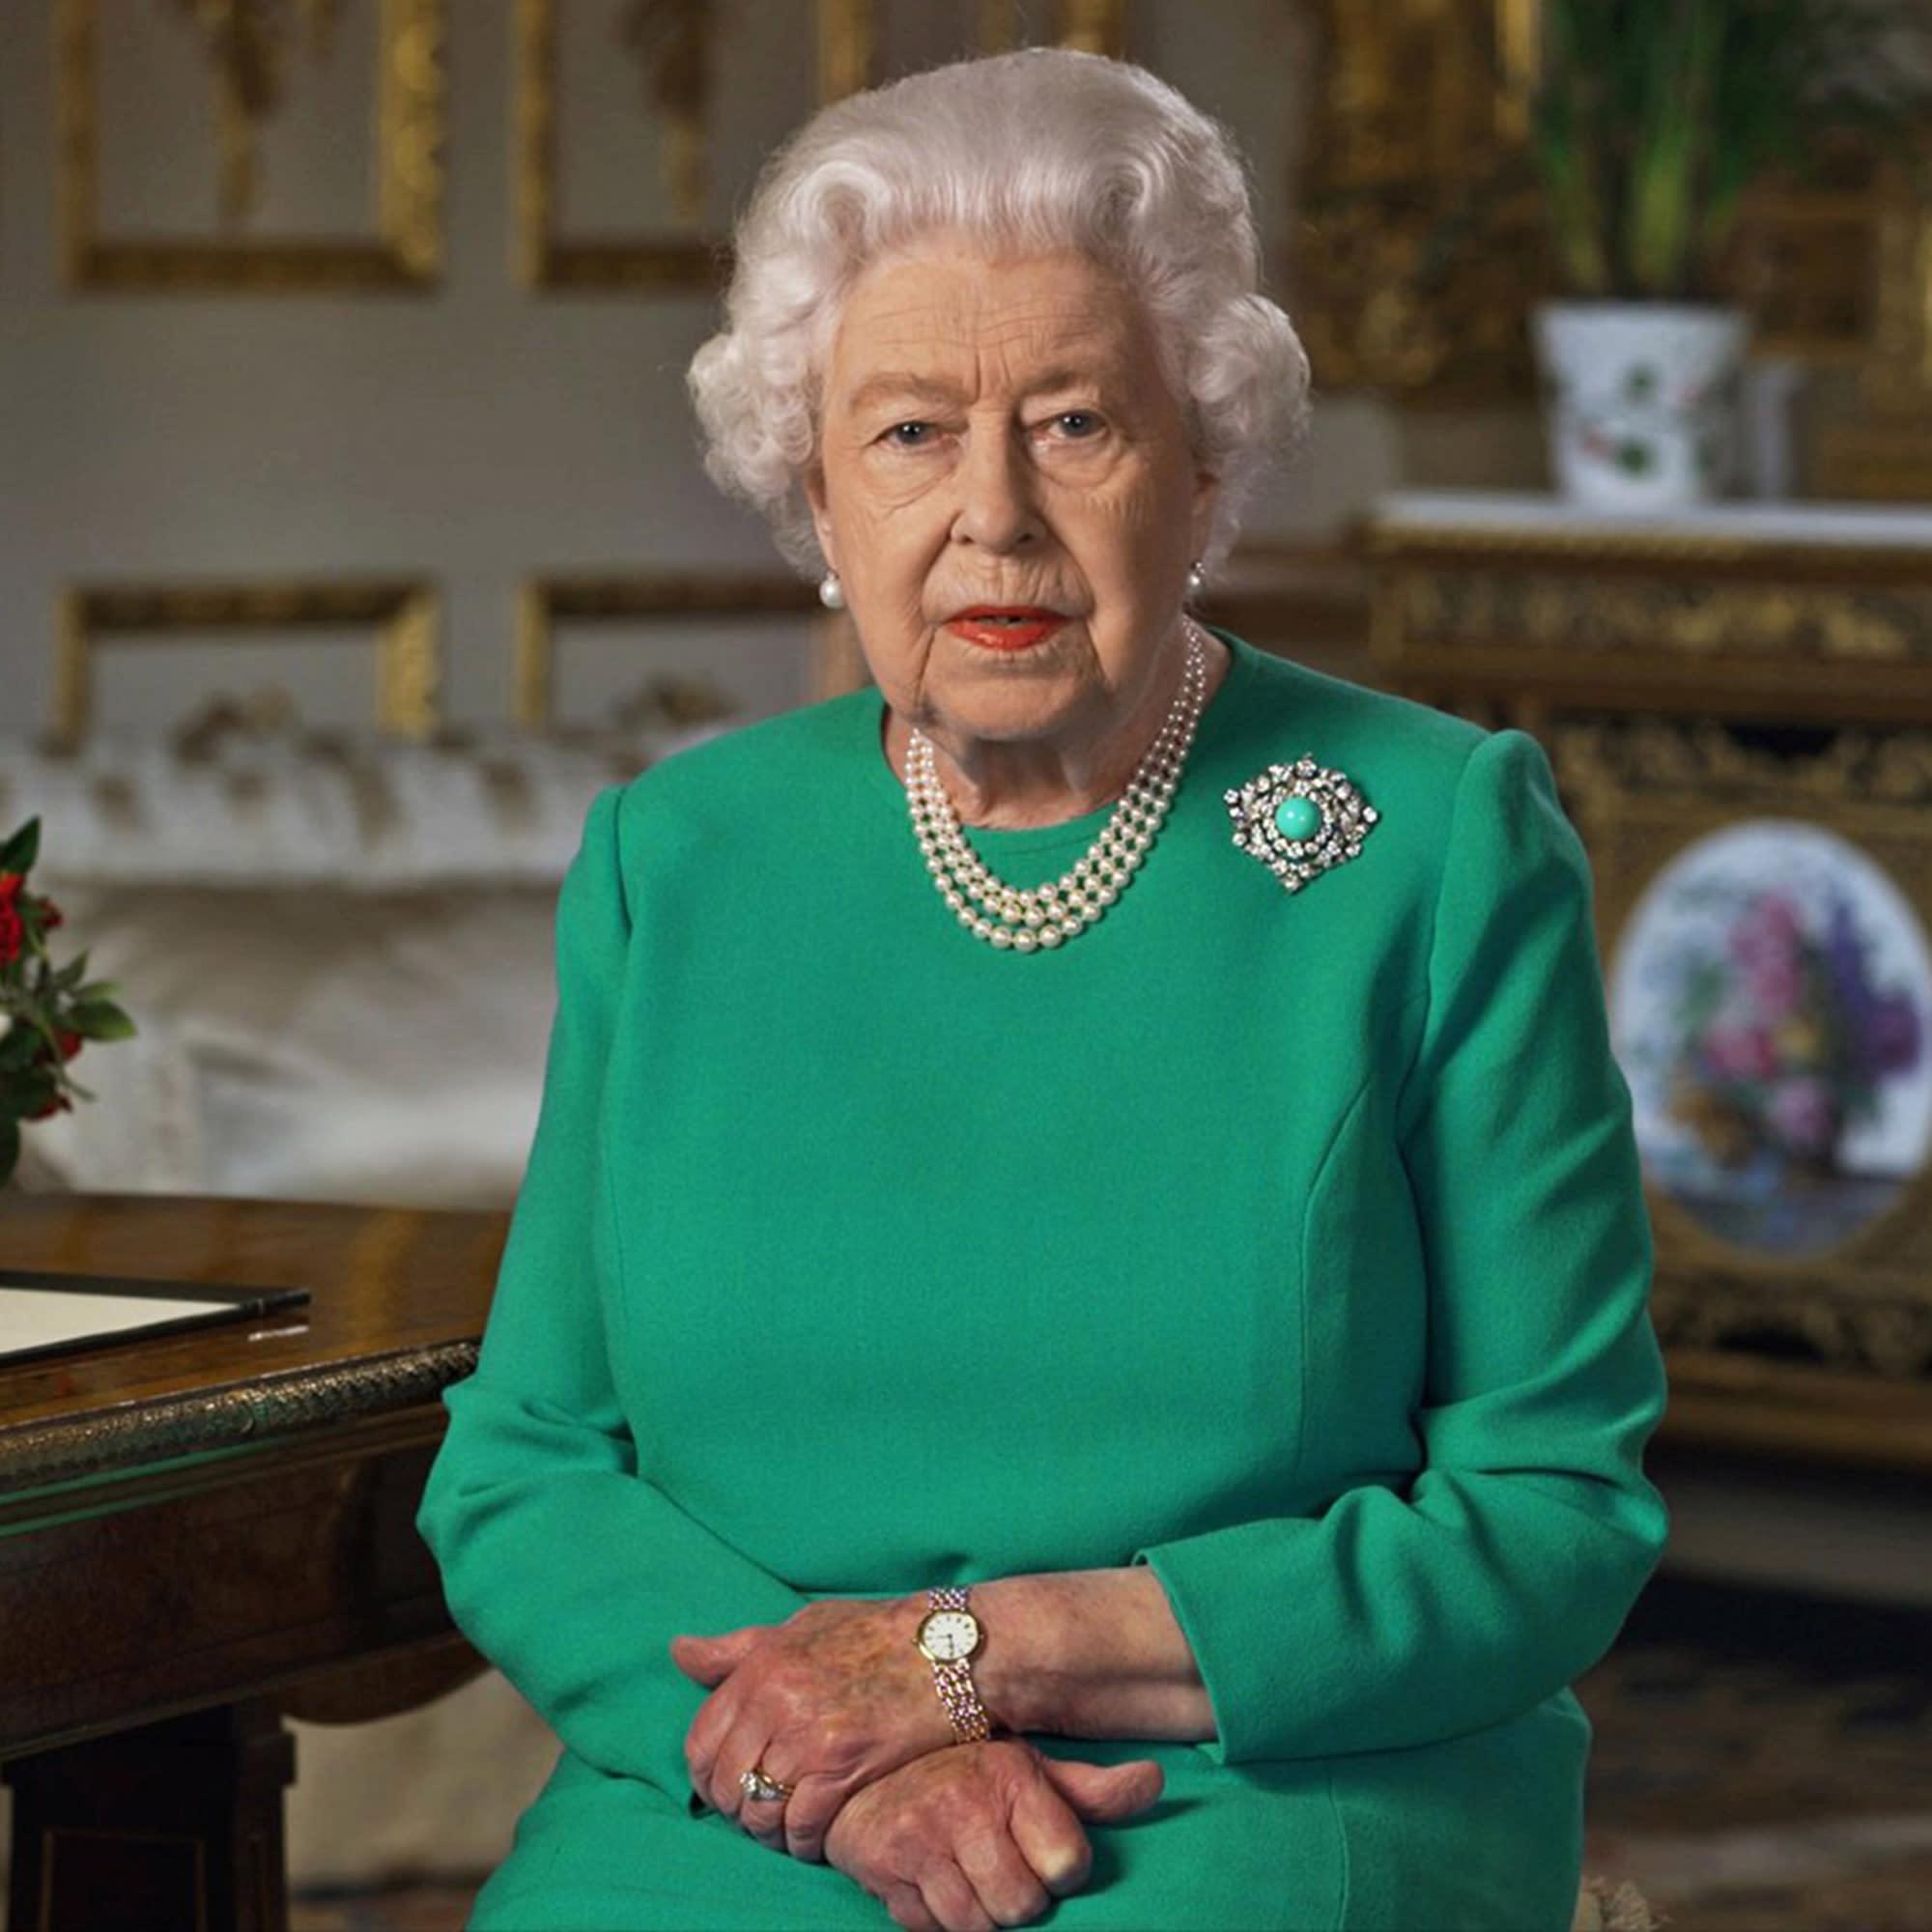 Queen Elizabeth II calls for 'good-humored resolve' as ...